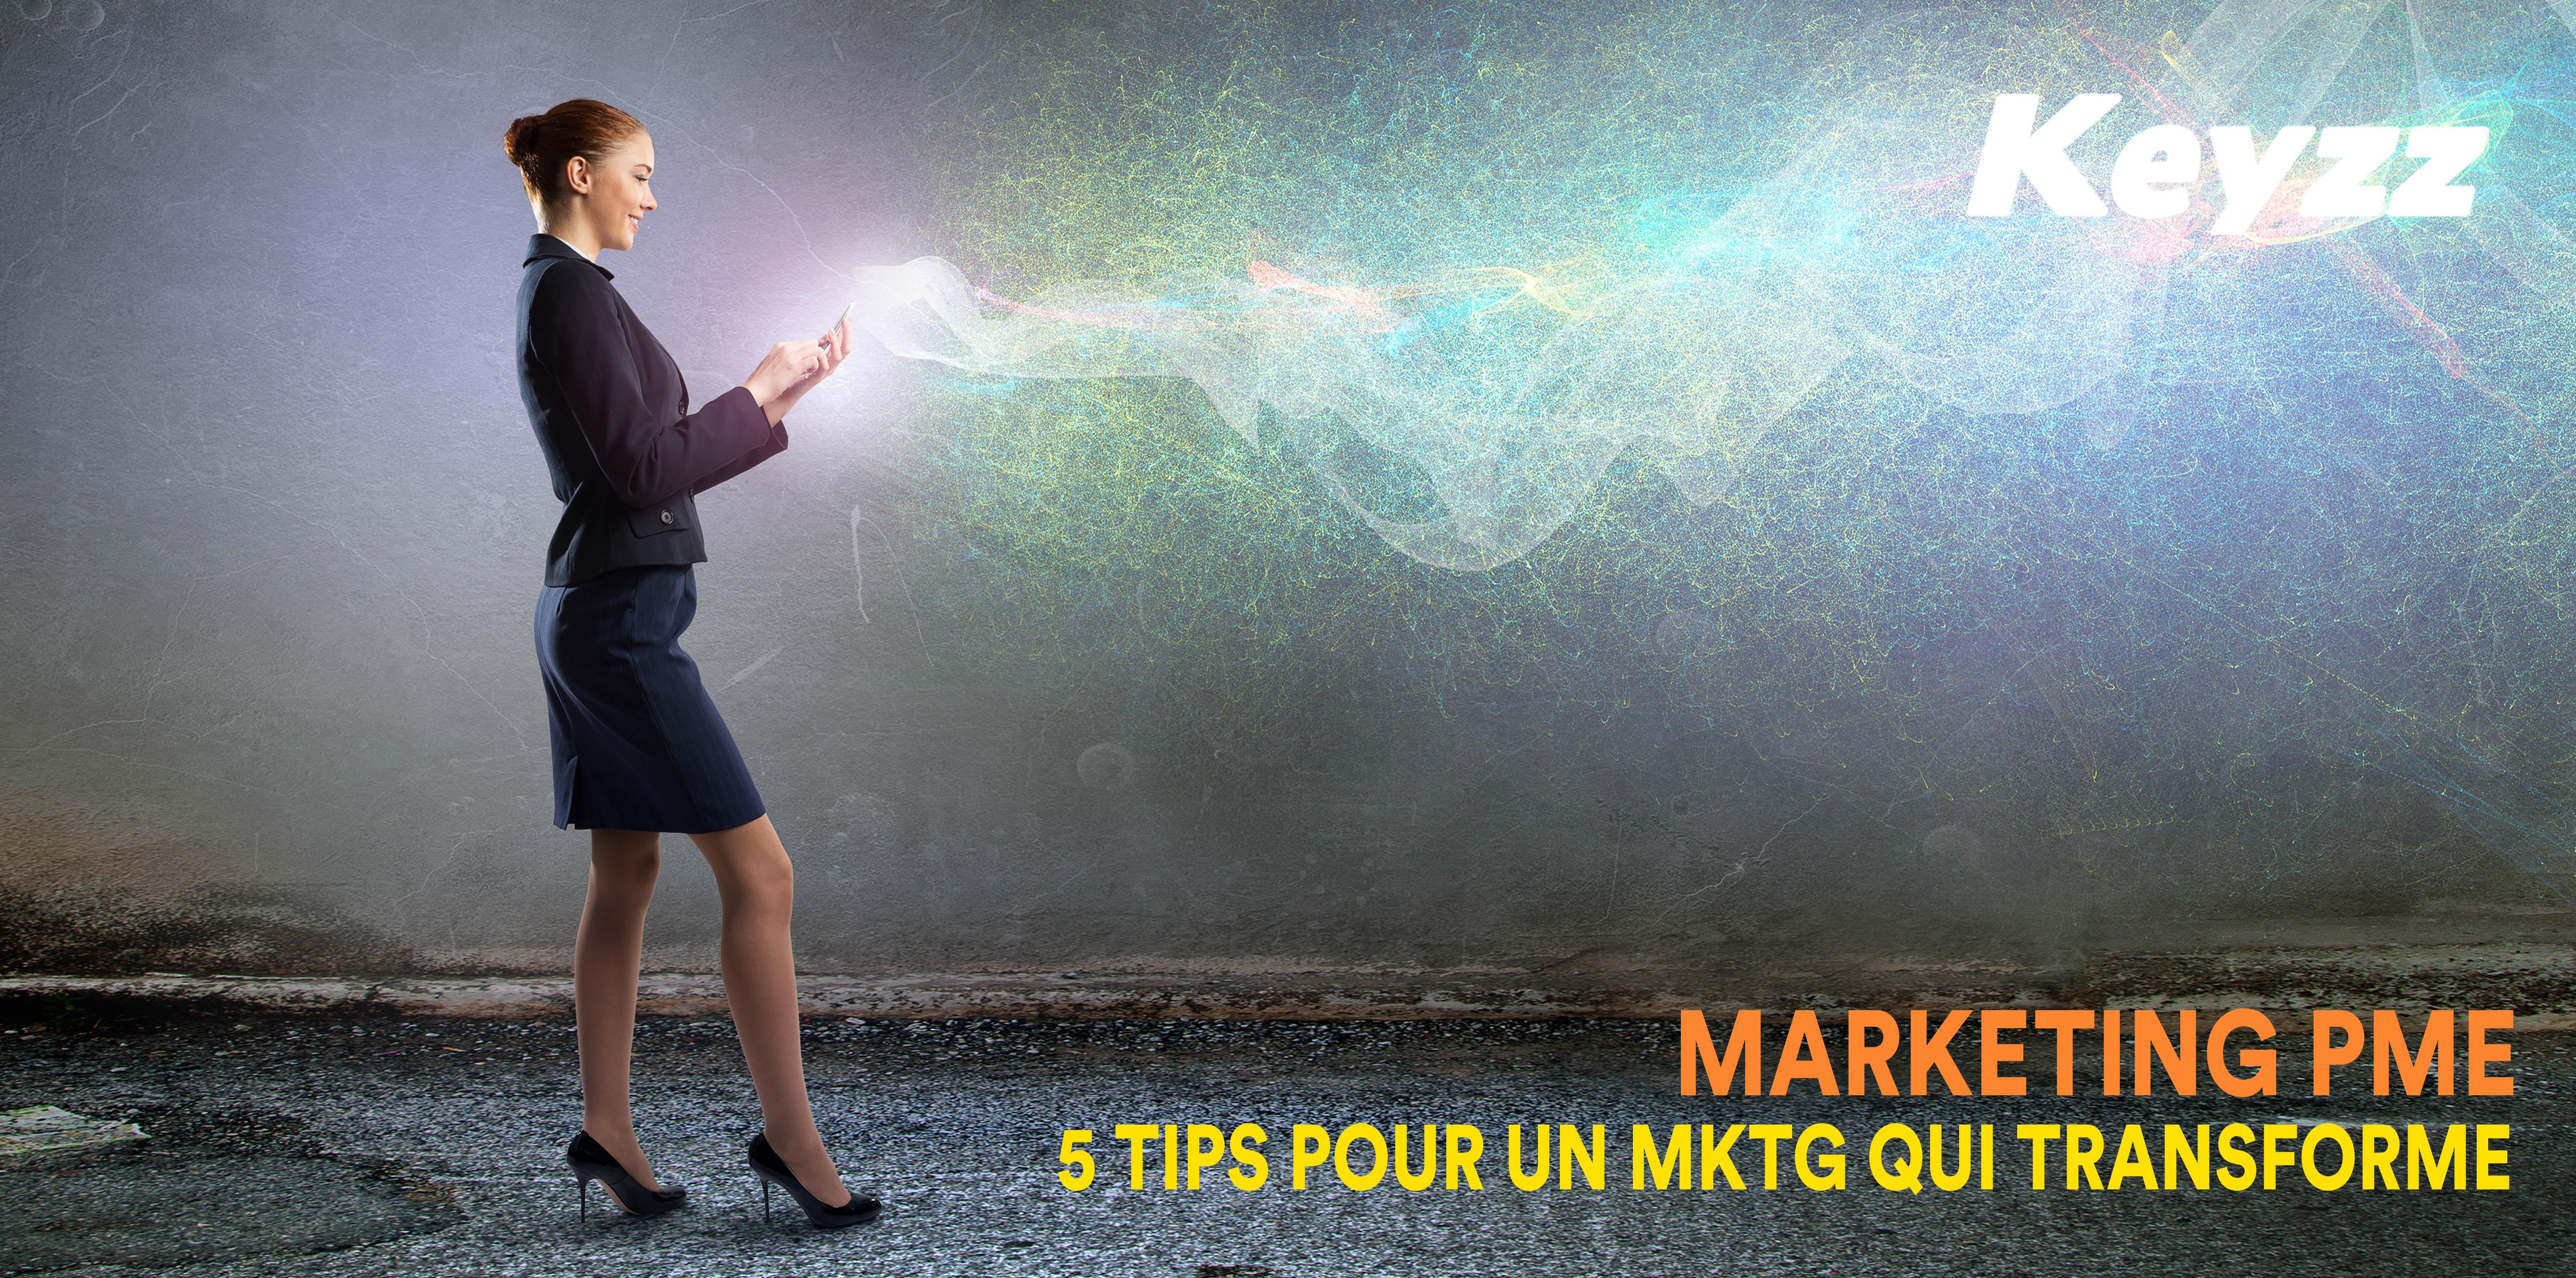 Blog_Keyzz_marketing_PME_5_TIPS